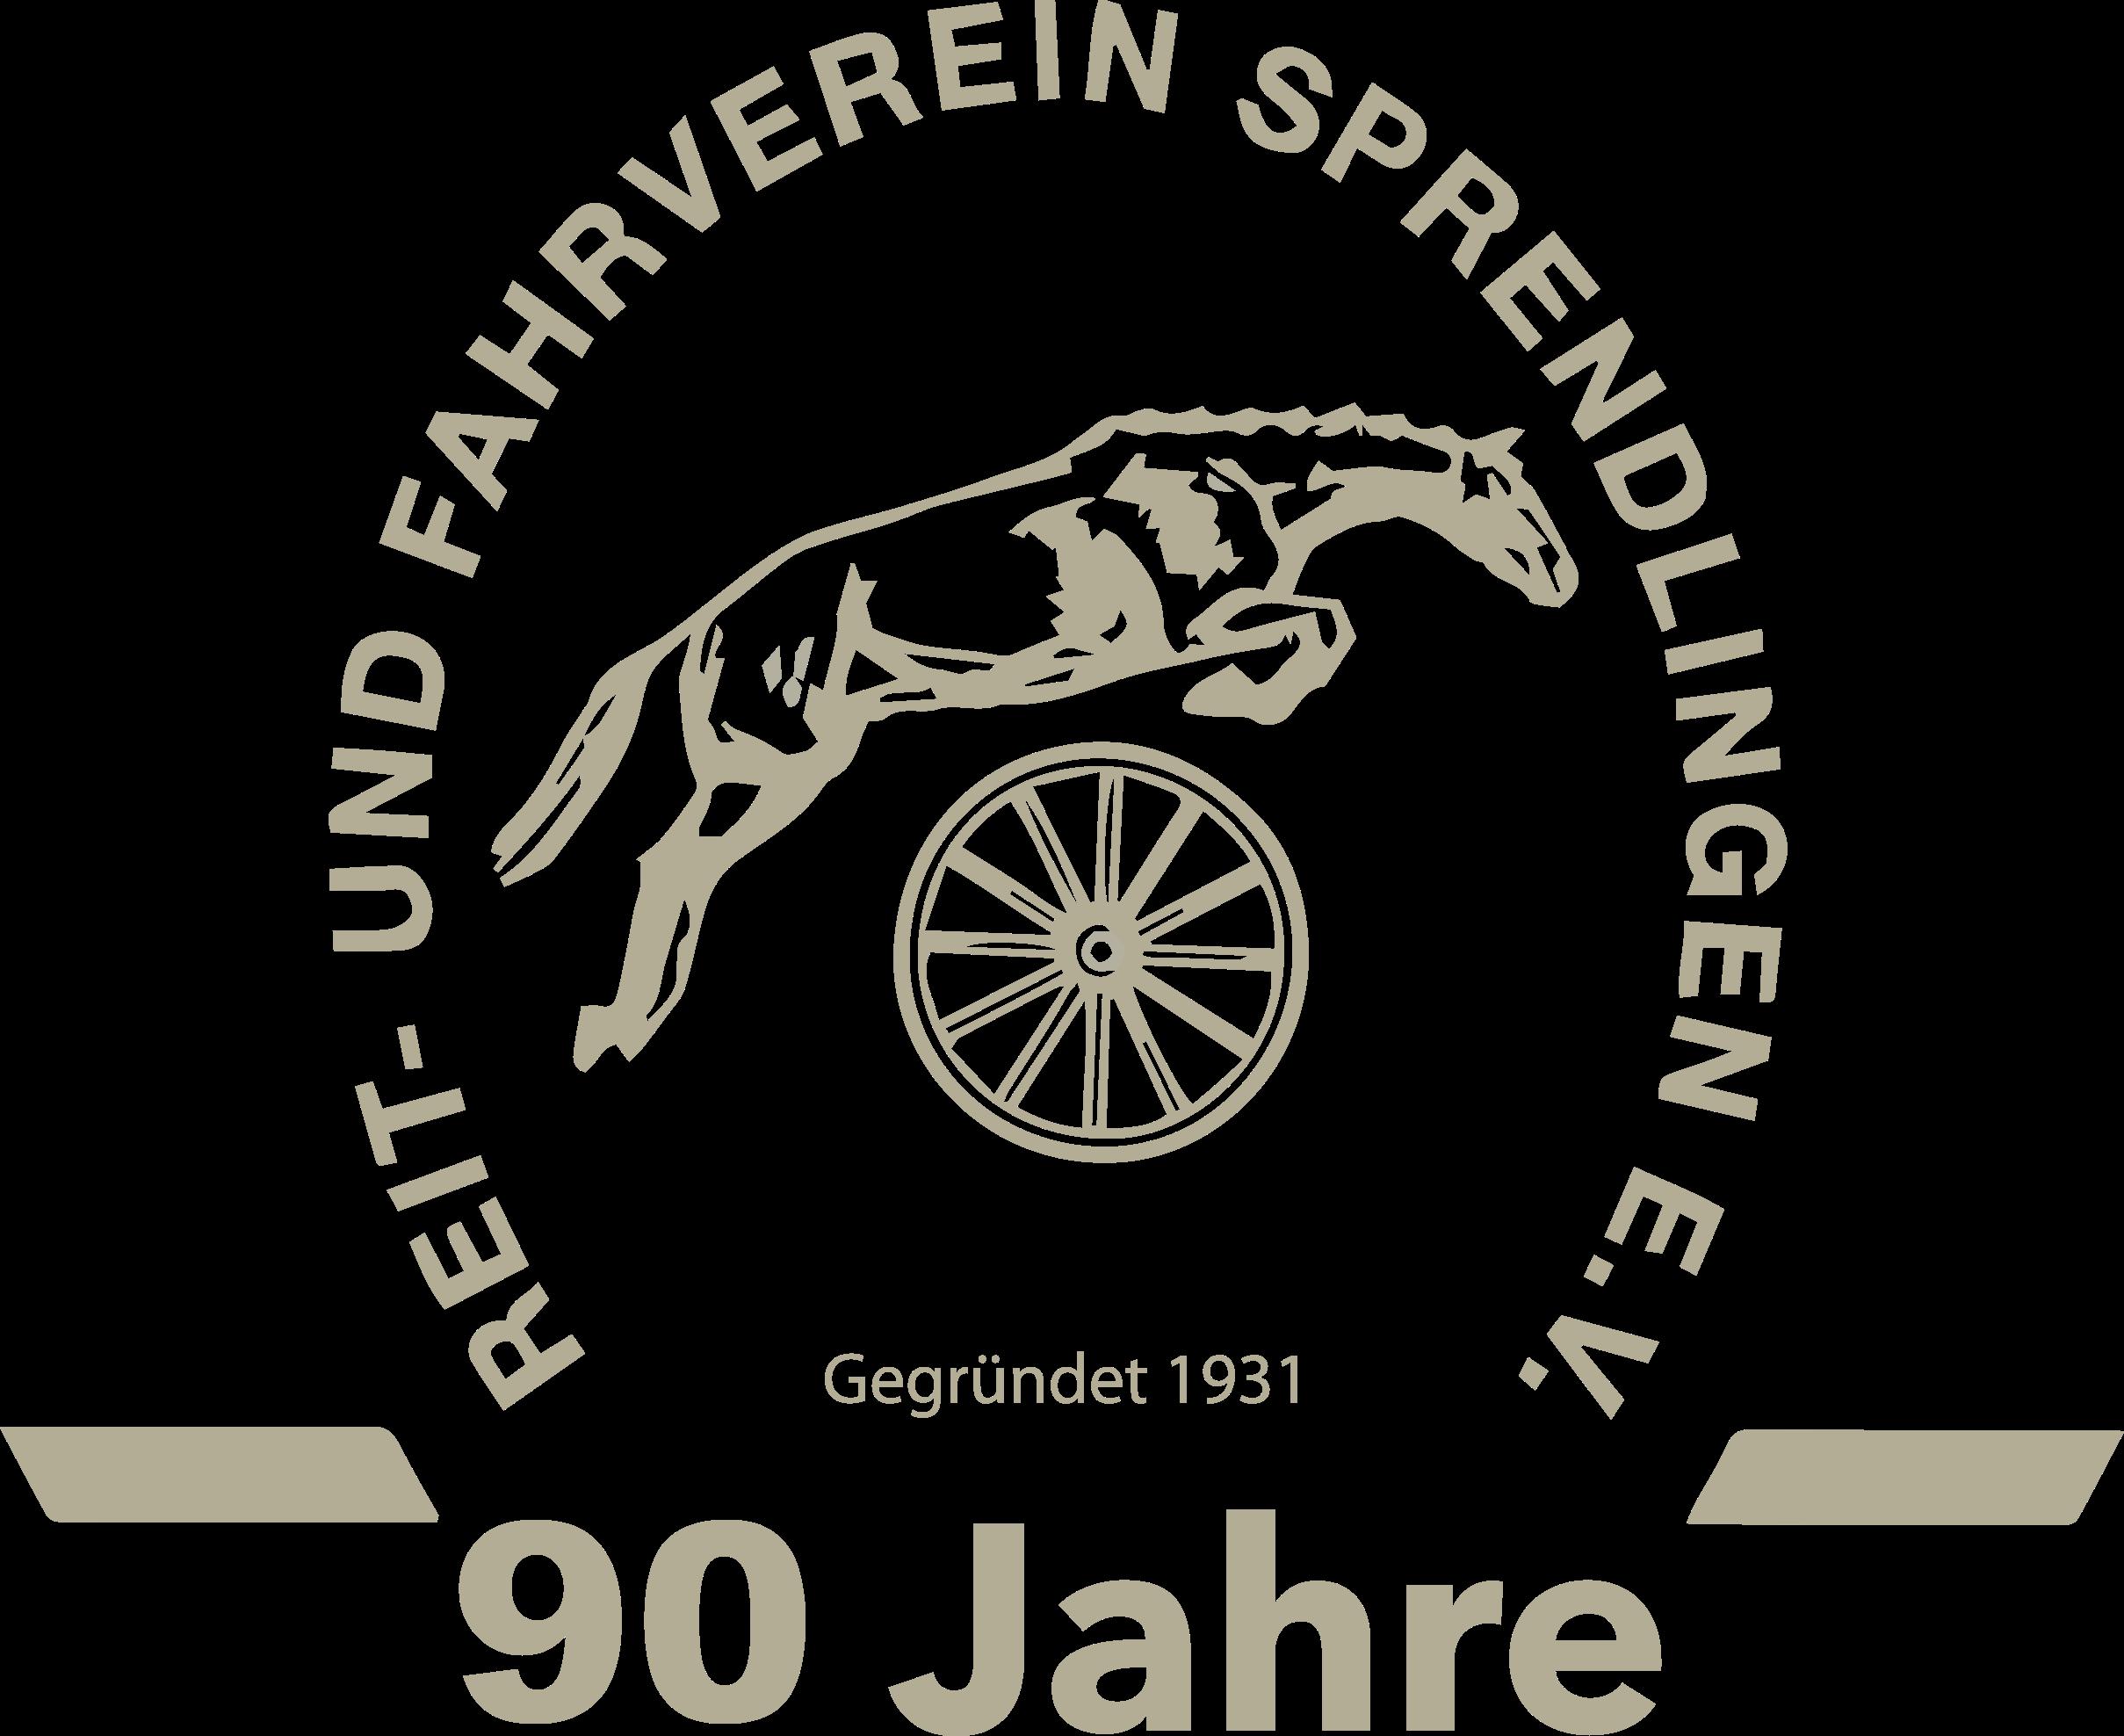 Reit- und Fahrverein Sprendlingen e.V.